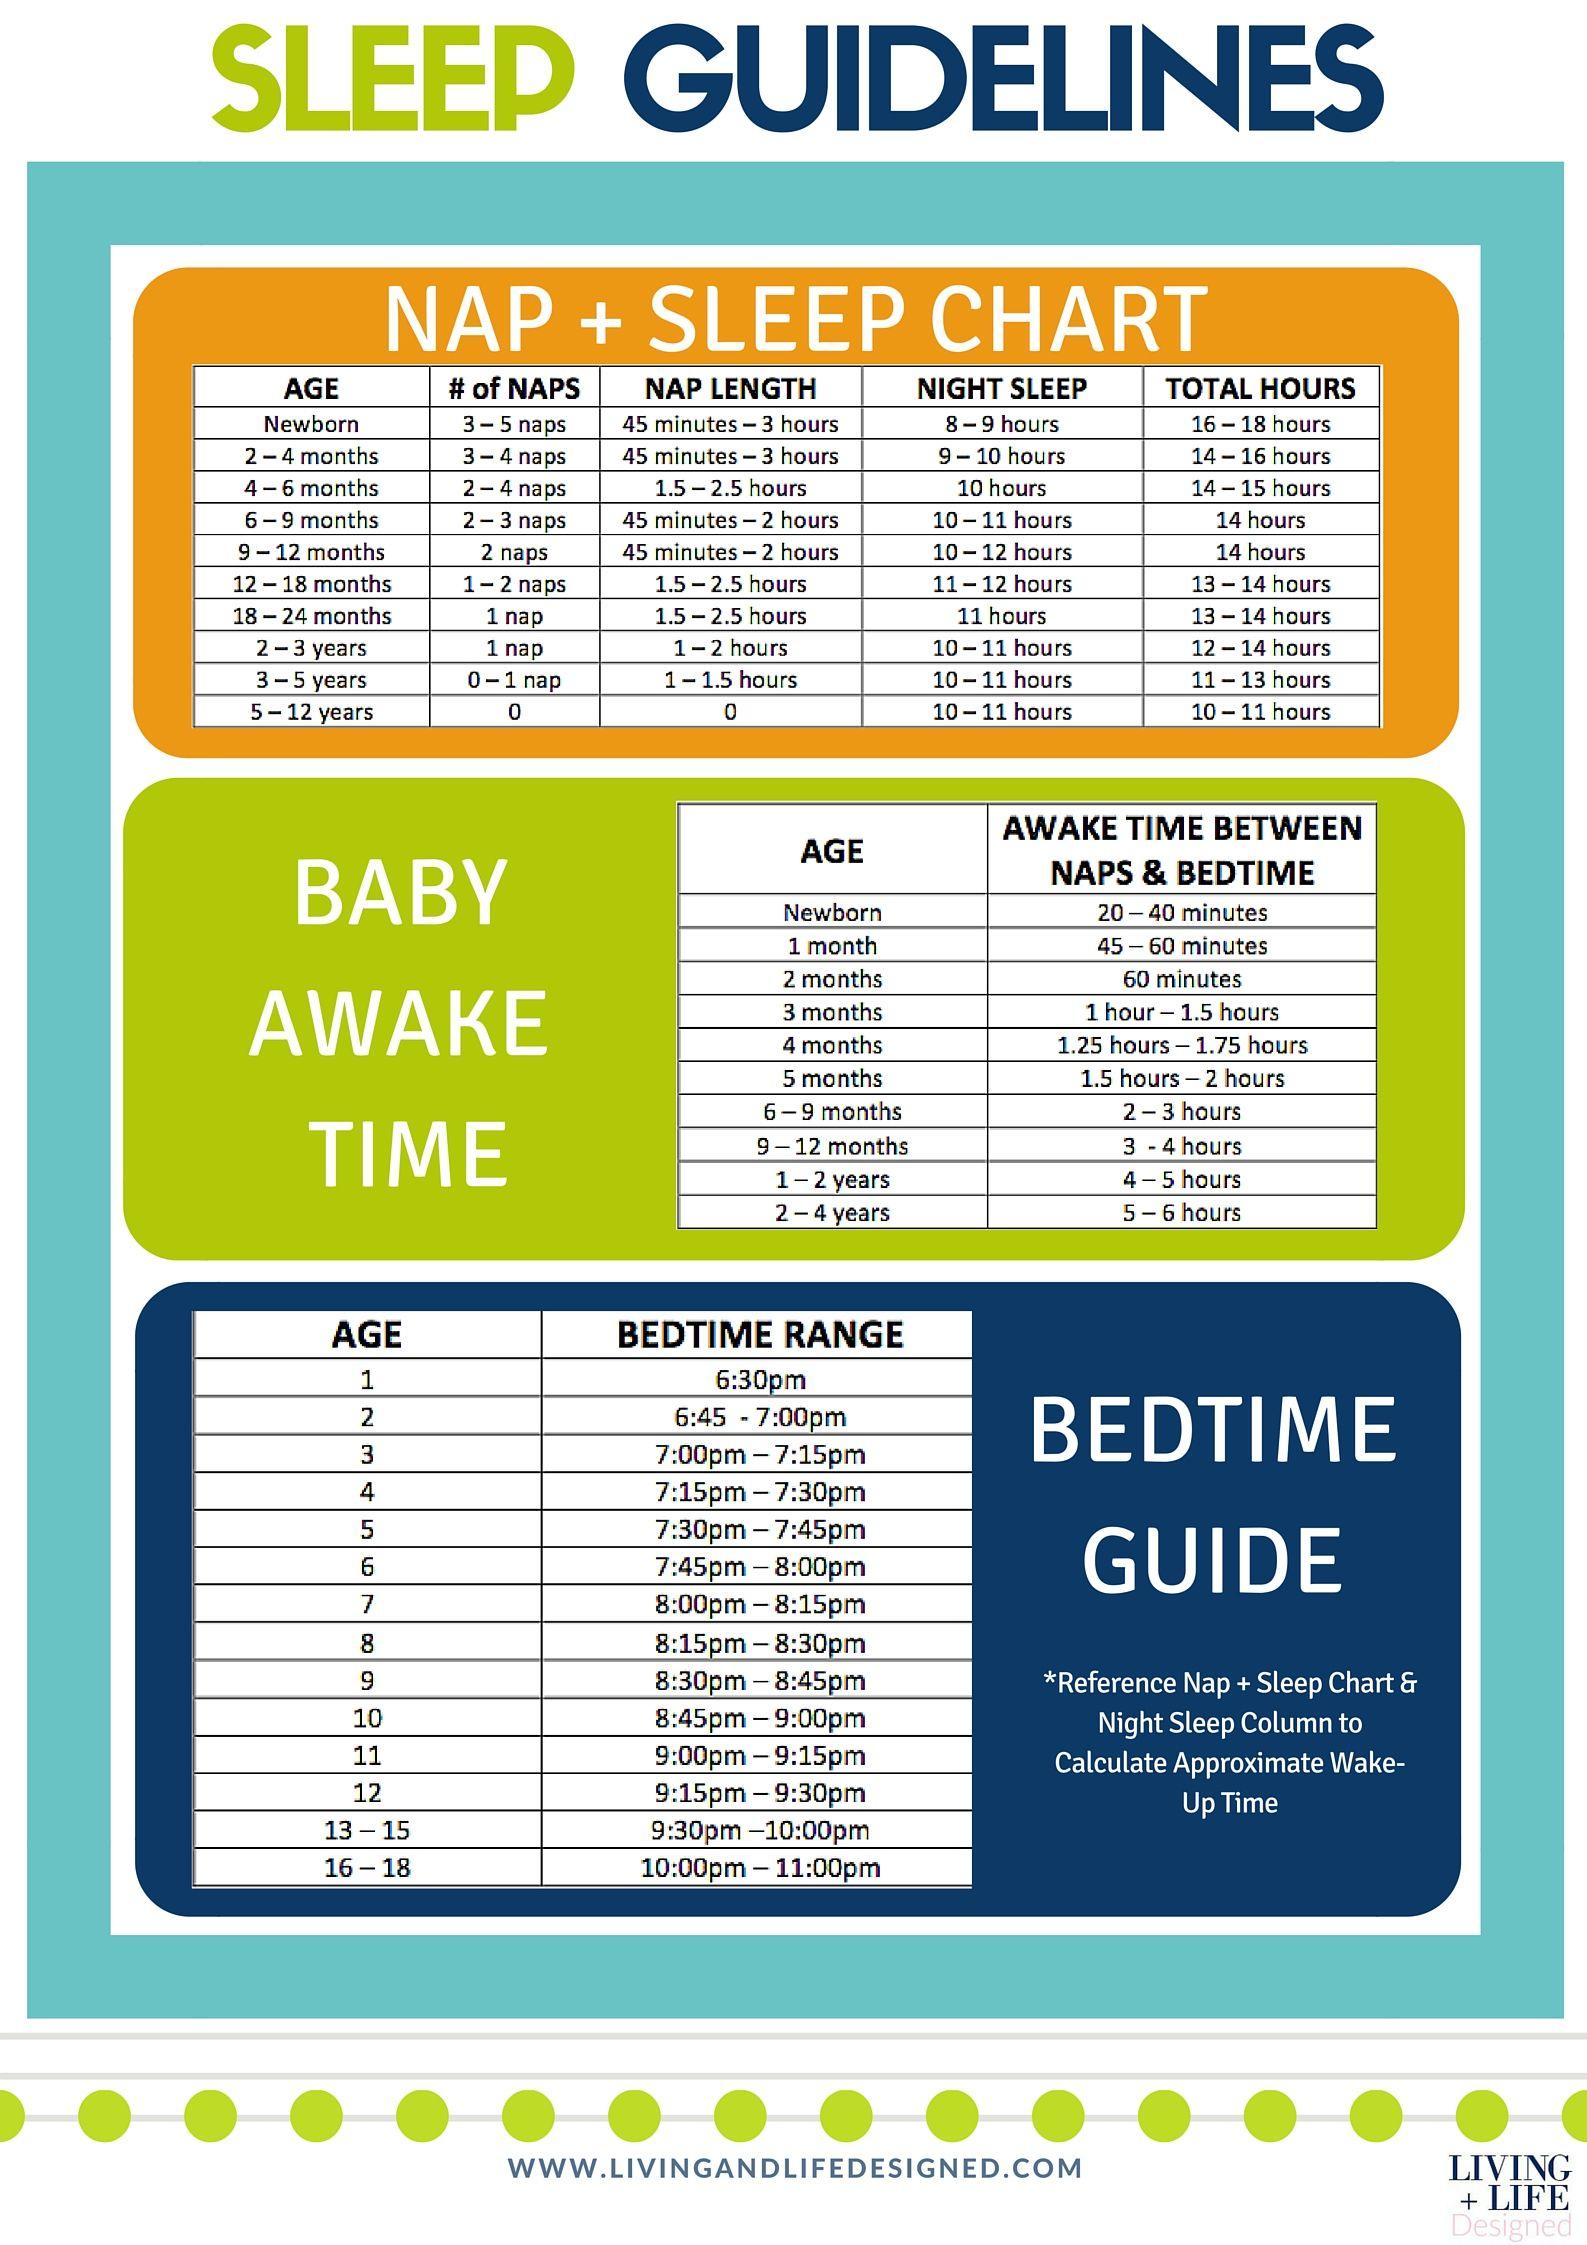 Guidelines for Sleep, Bedtimes & Baby Awake Times | Bedtime ...